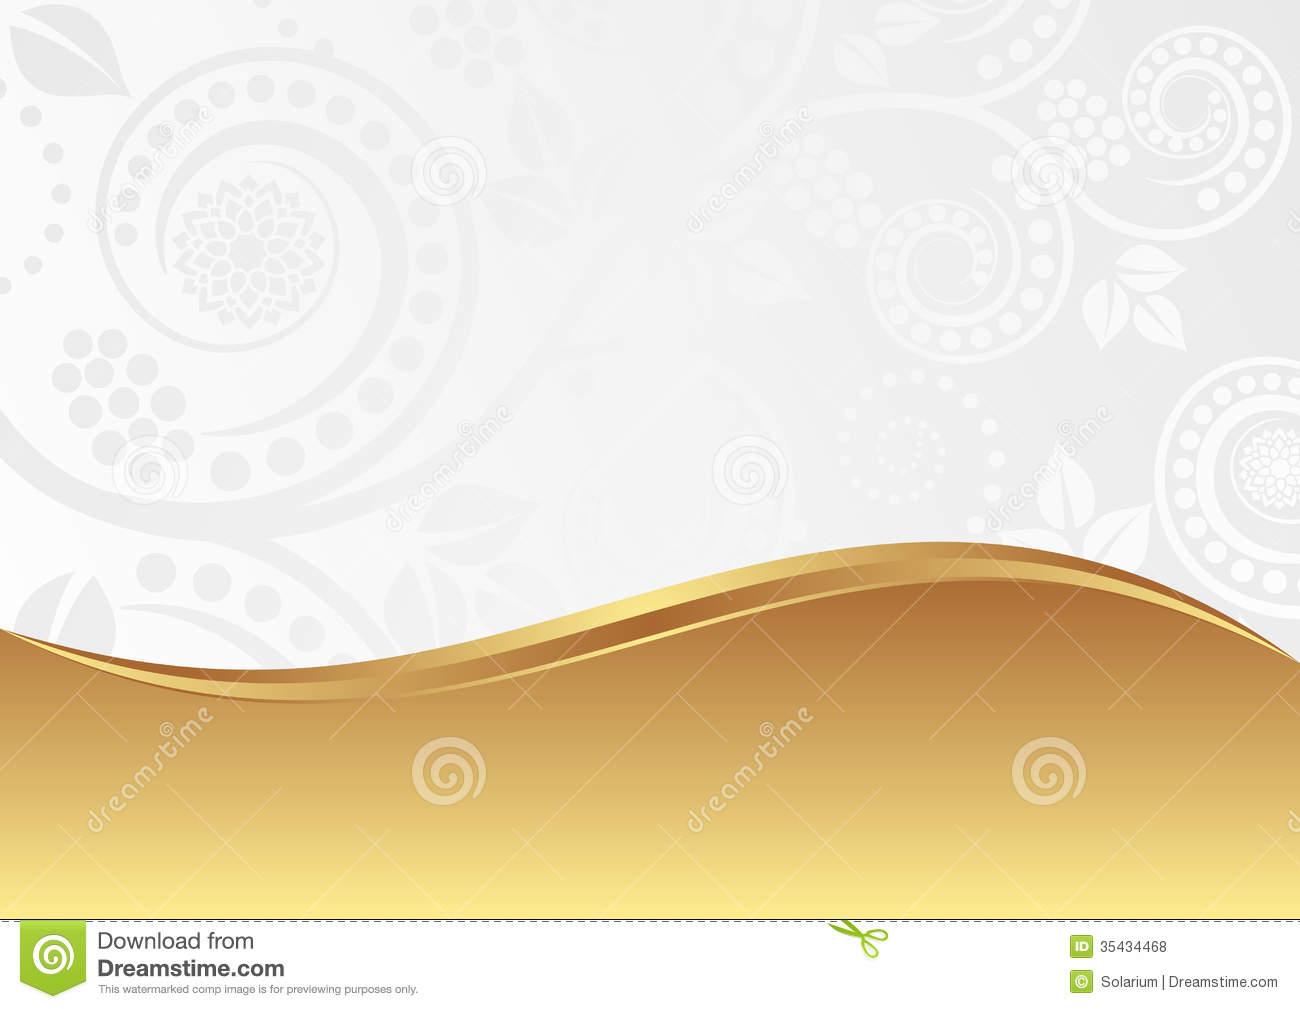 White and Gold Wallpaper - WallpaperSafari